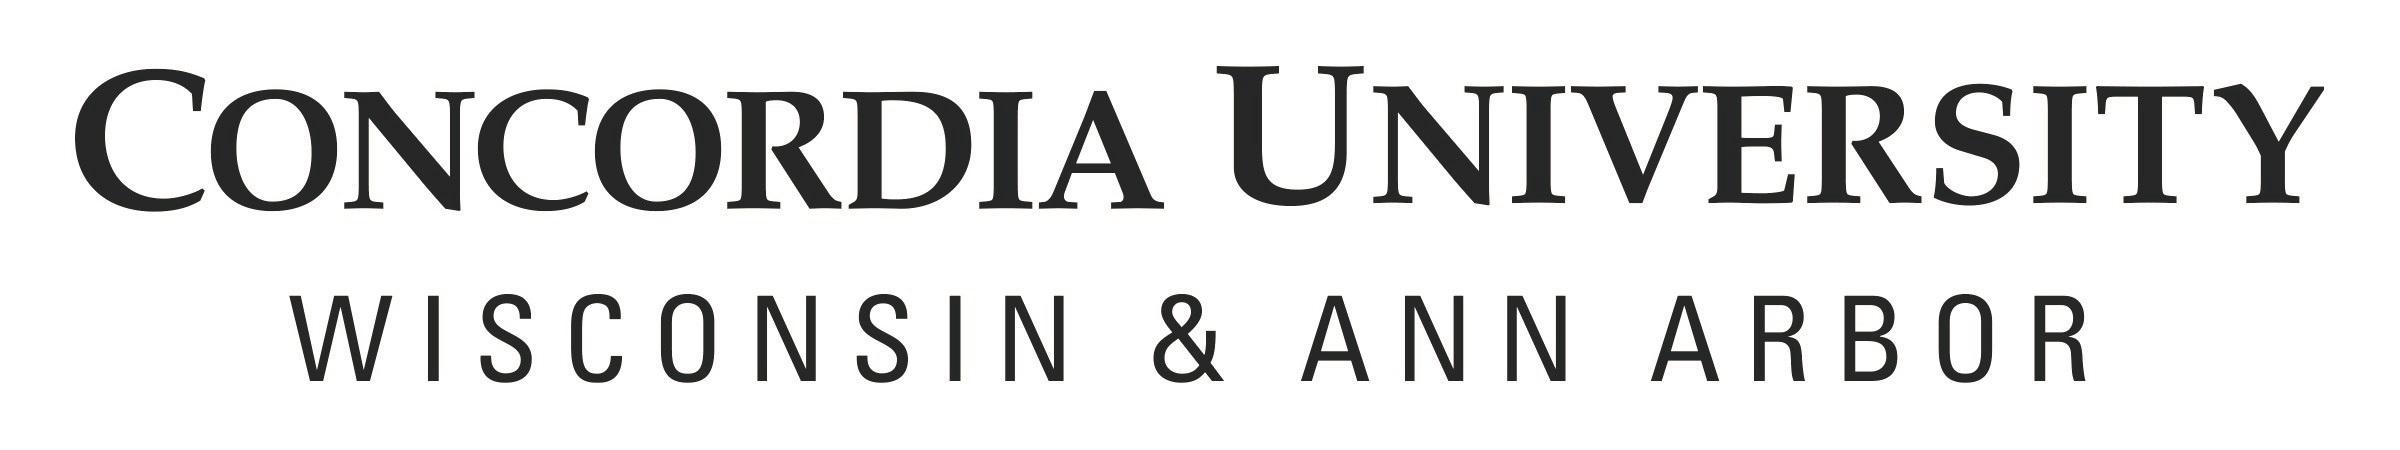 Concordia University Wisconsin/Ann Arbor logo